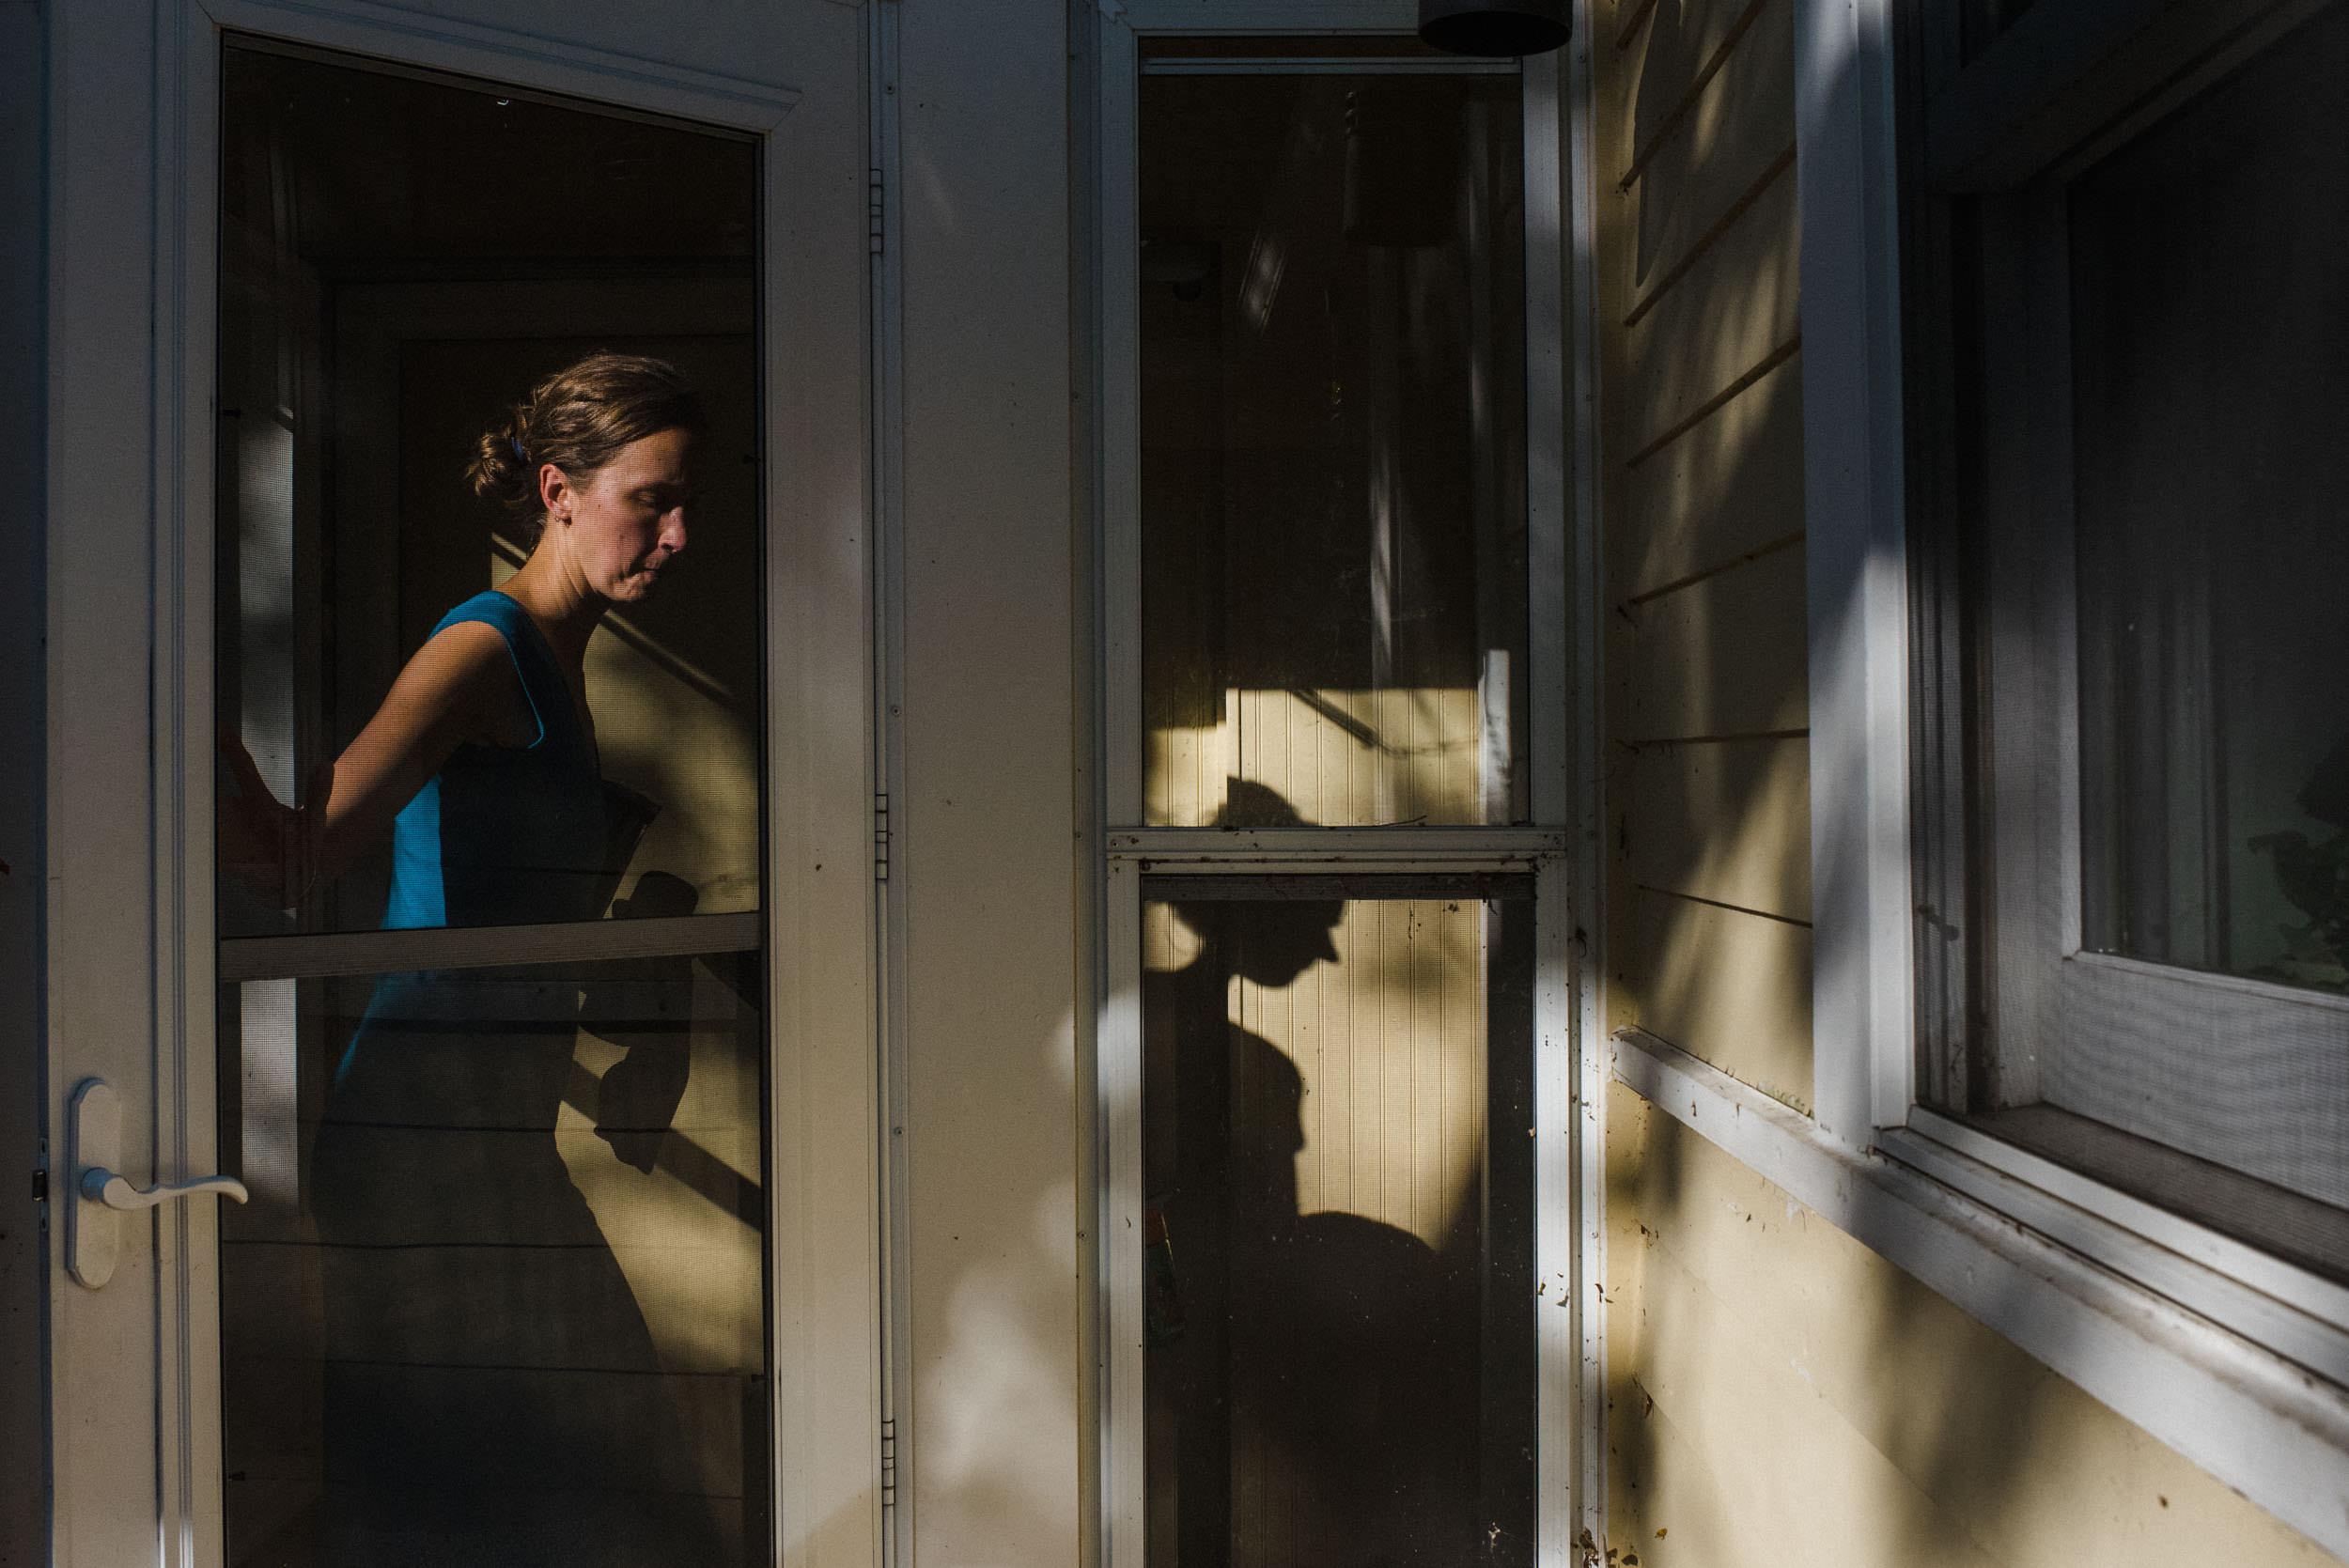 mom entering the house through the backdoor